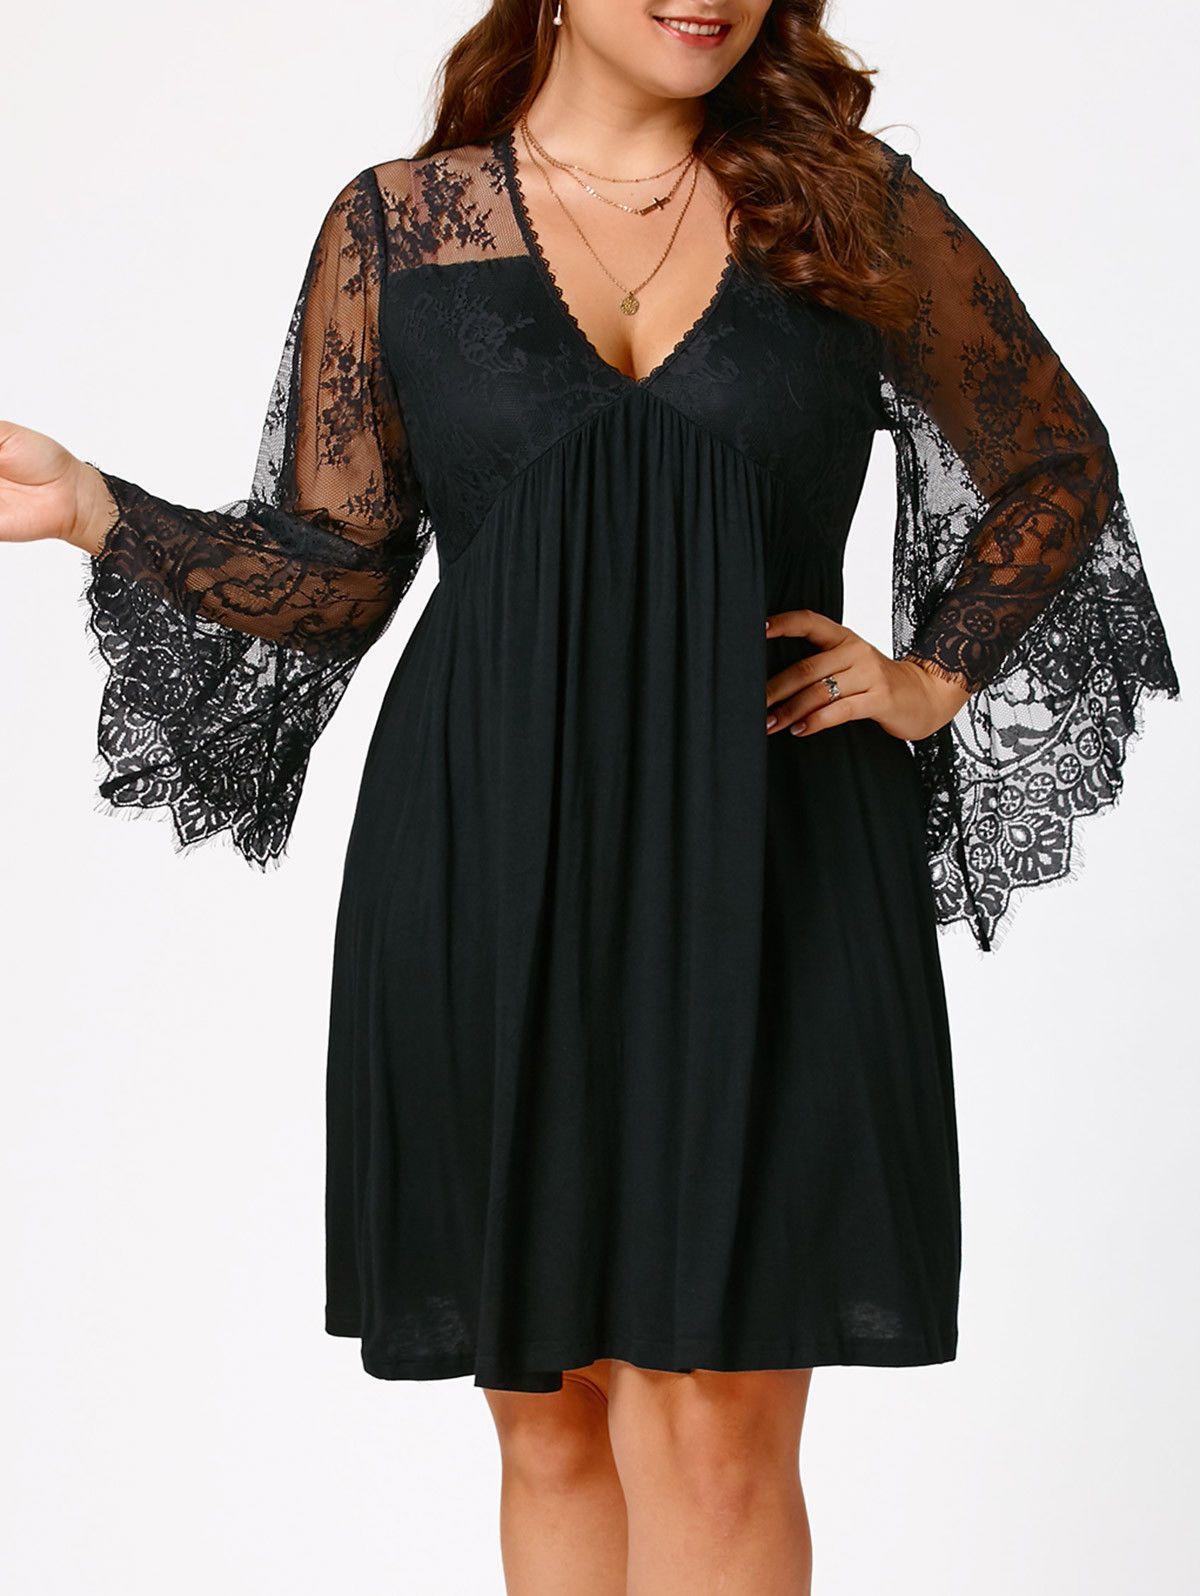 728e345a12f  14.99 - Women Lace Insert Plus Size Tunic Evening Party Long Flare Sleeve  Dress Xl-5Xl  ebay  Fashion